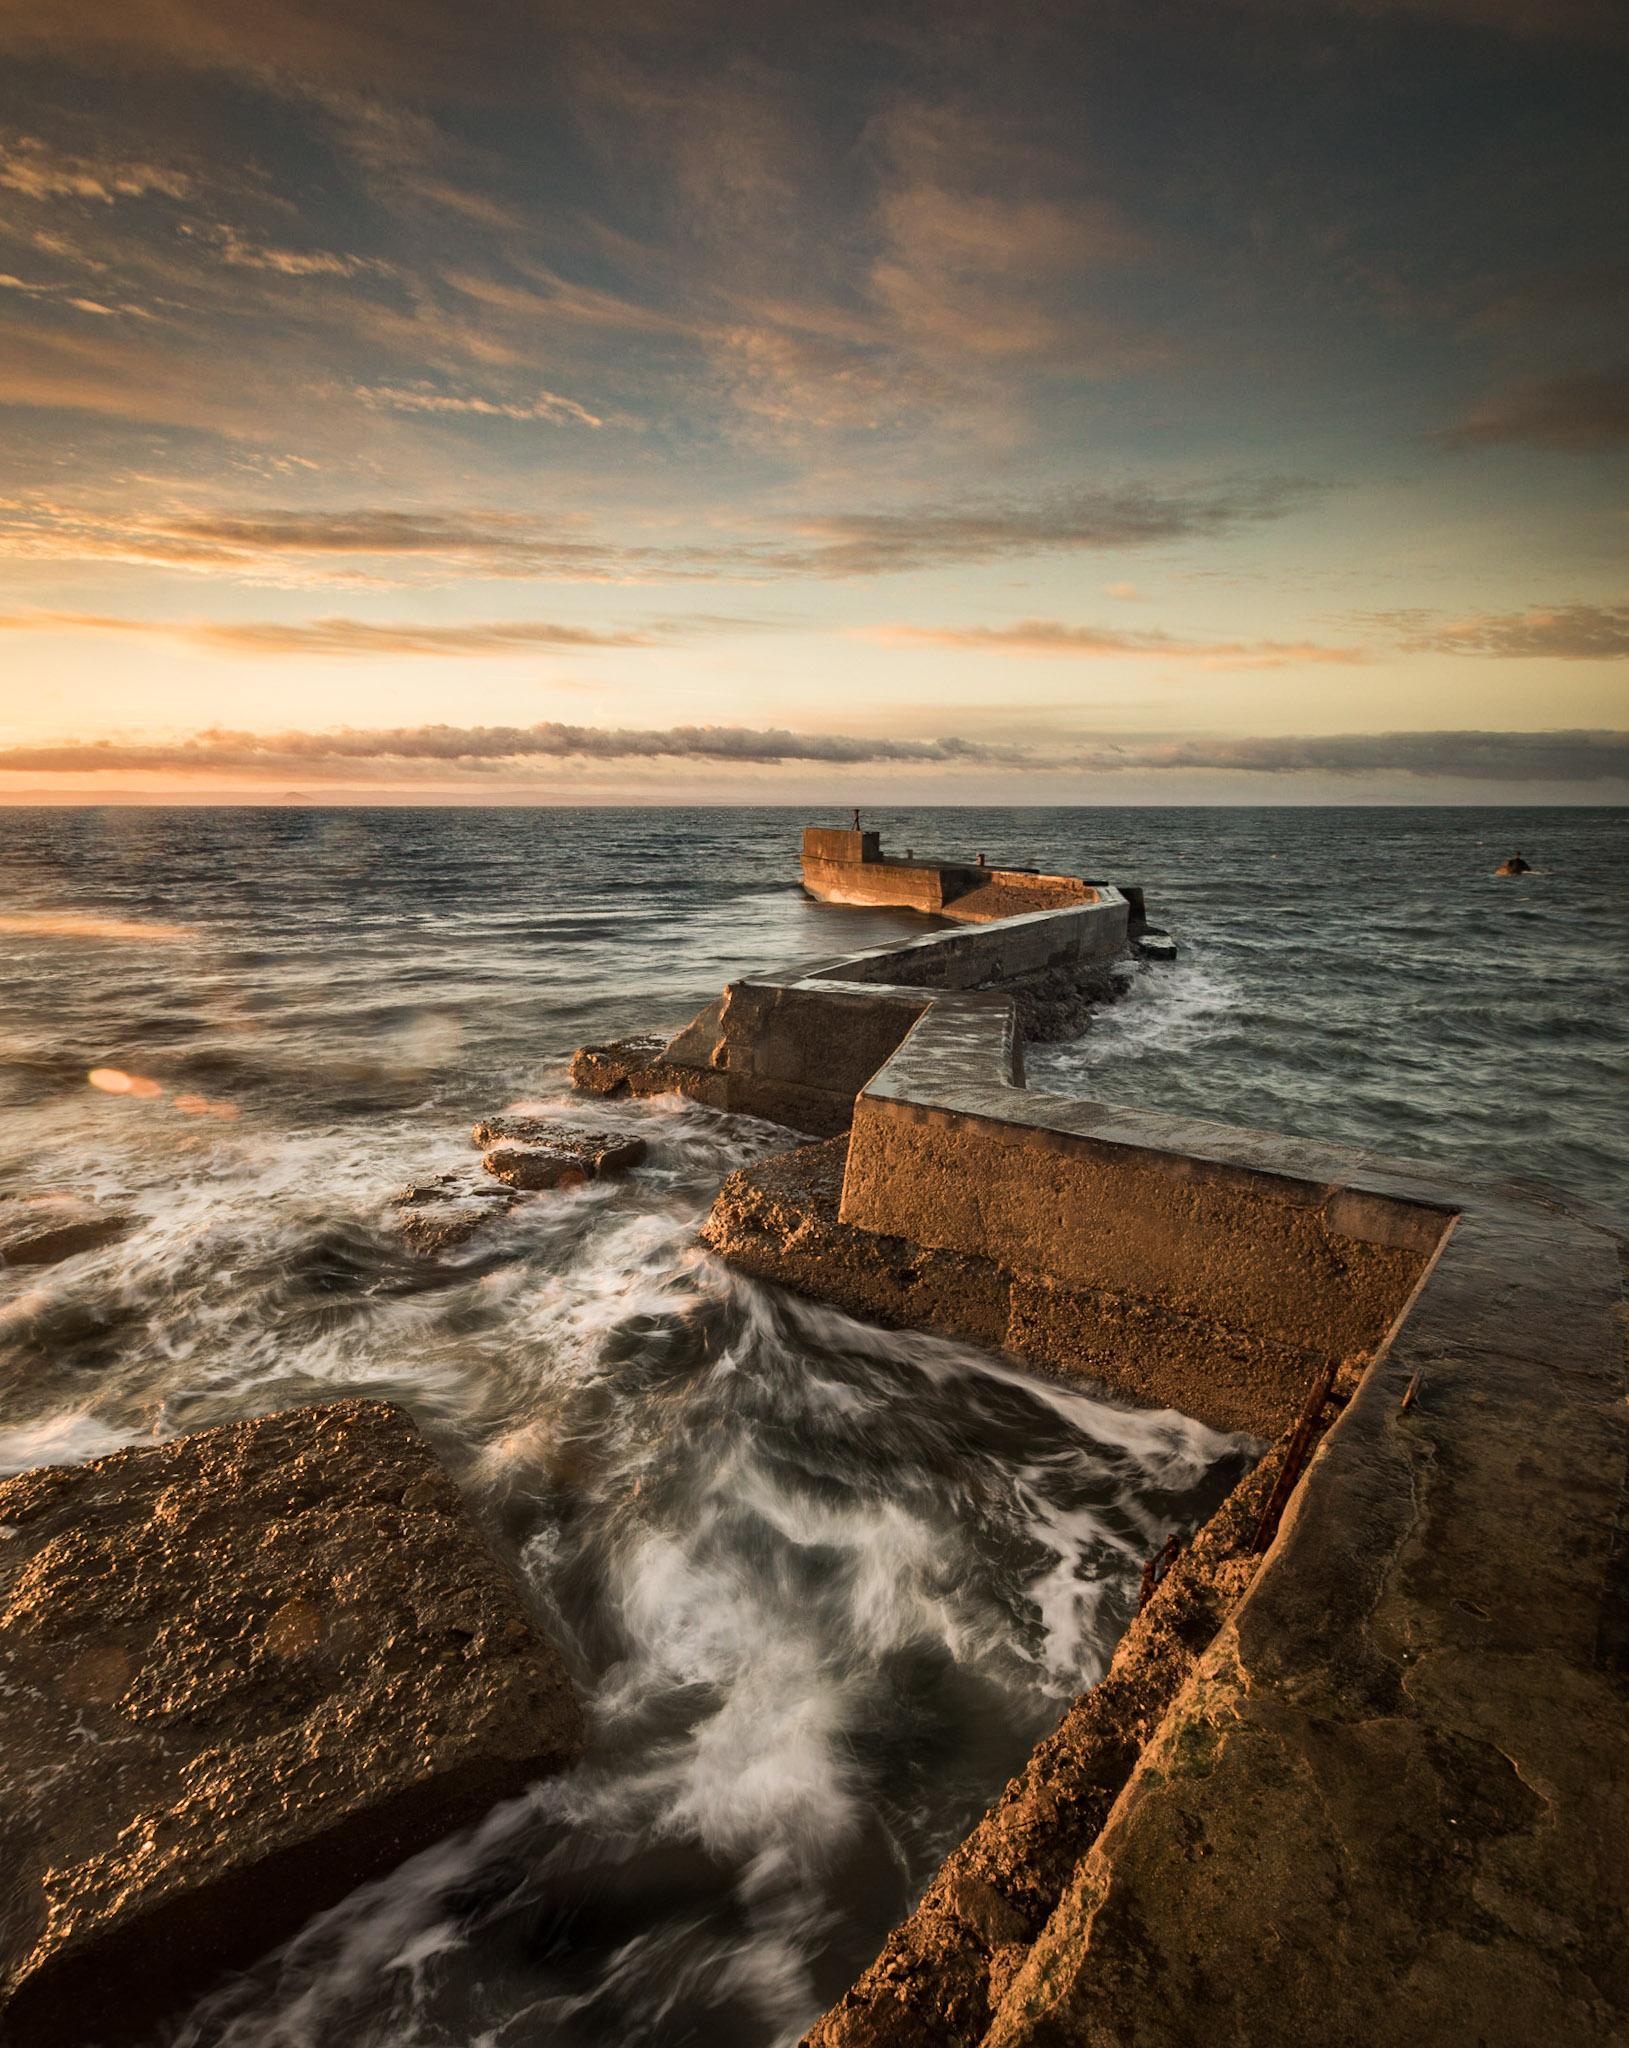 St Monans - Fife